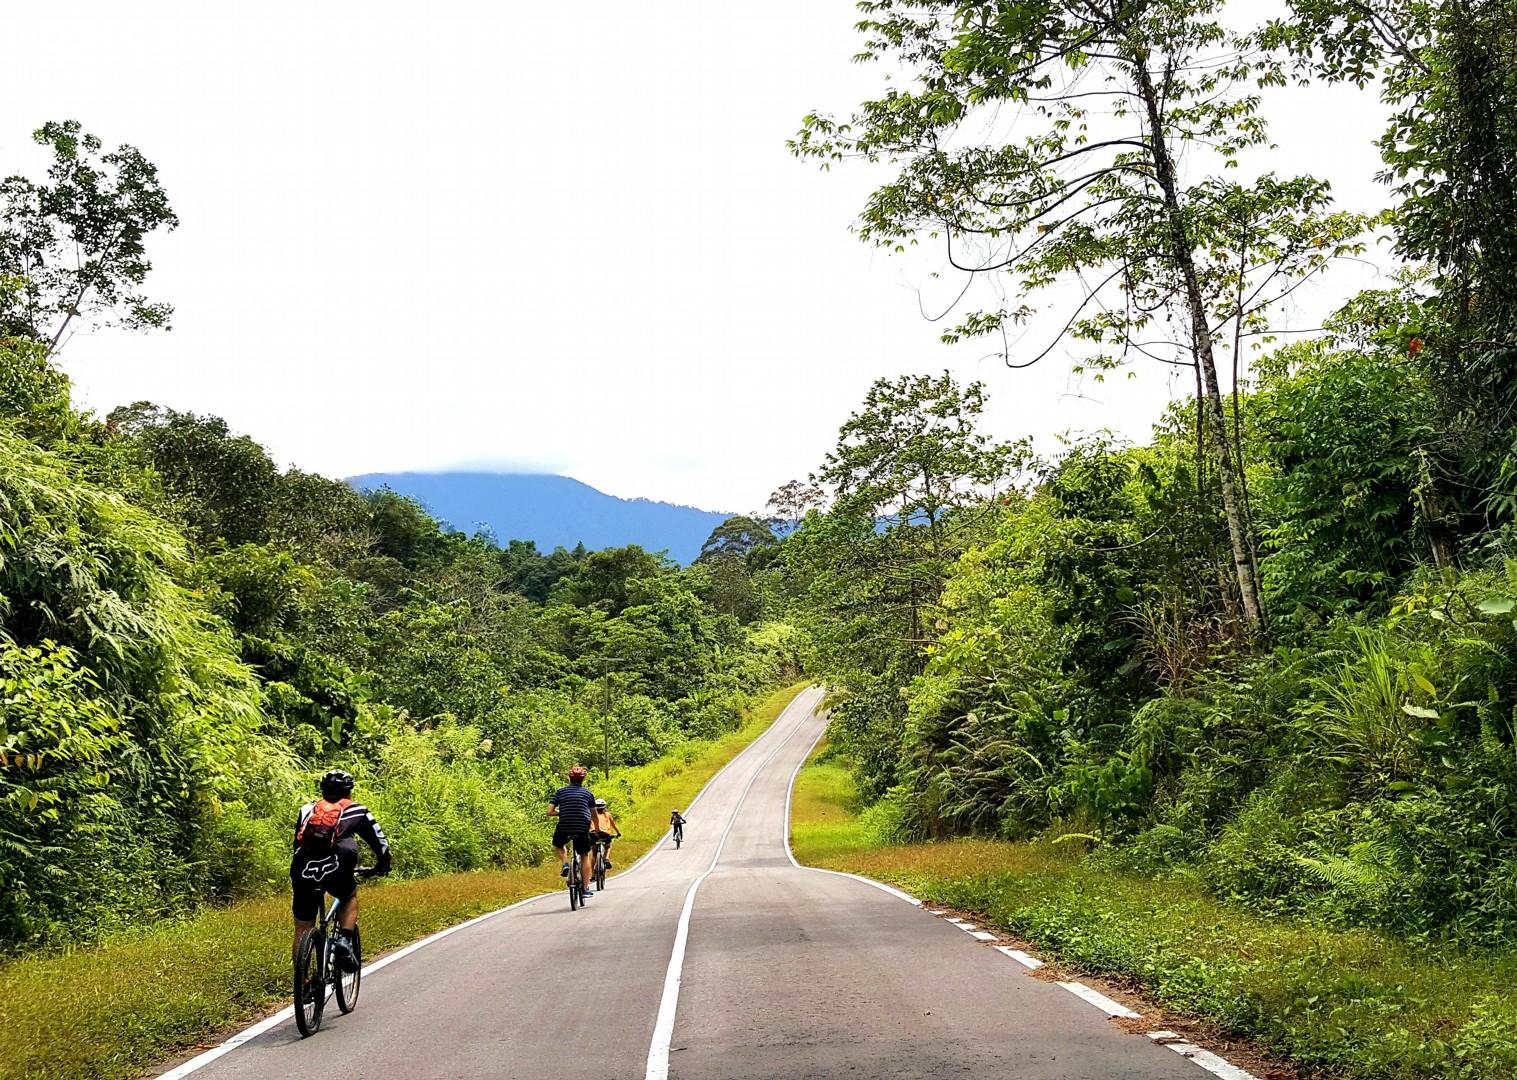 borneo-cycle-trip-skedaddle.jpg - NEW! Borneo - Secret Sarawak - Cycling Adventures